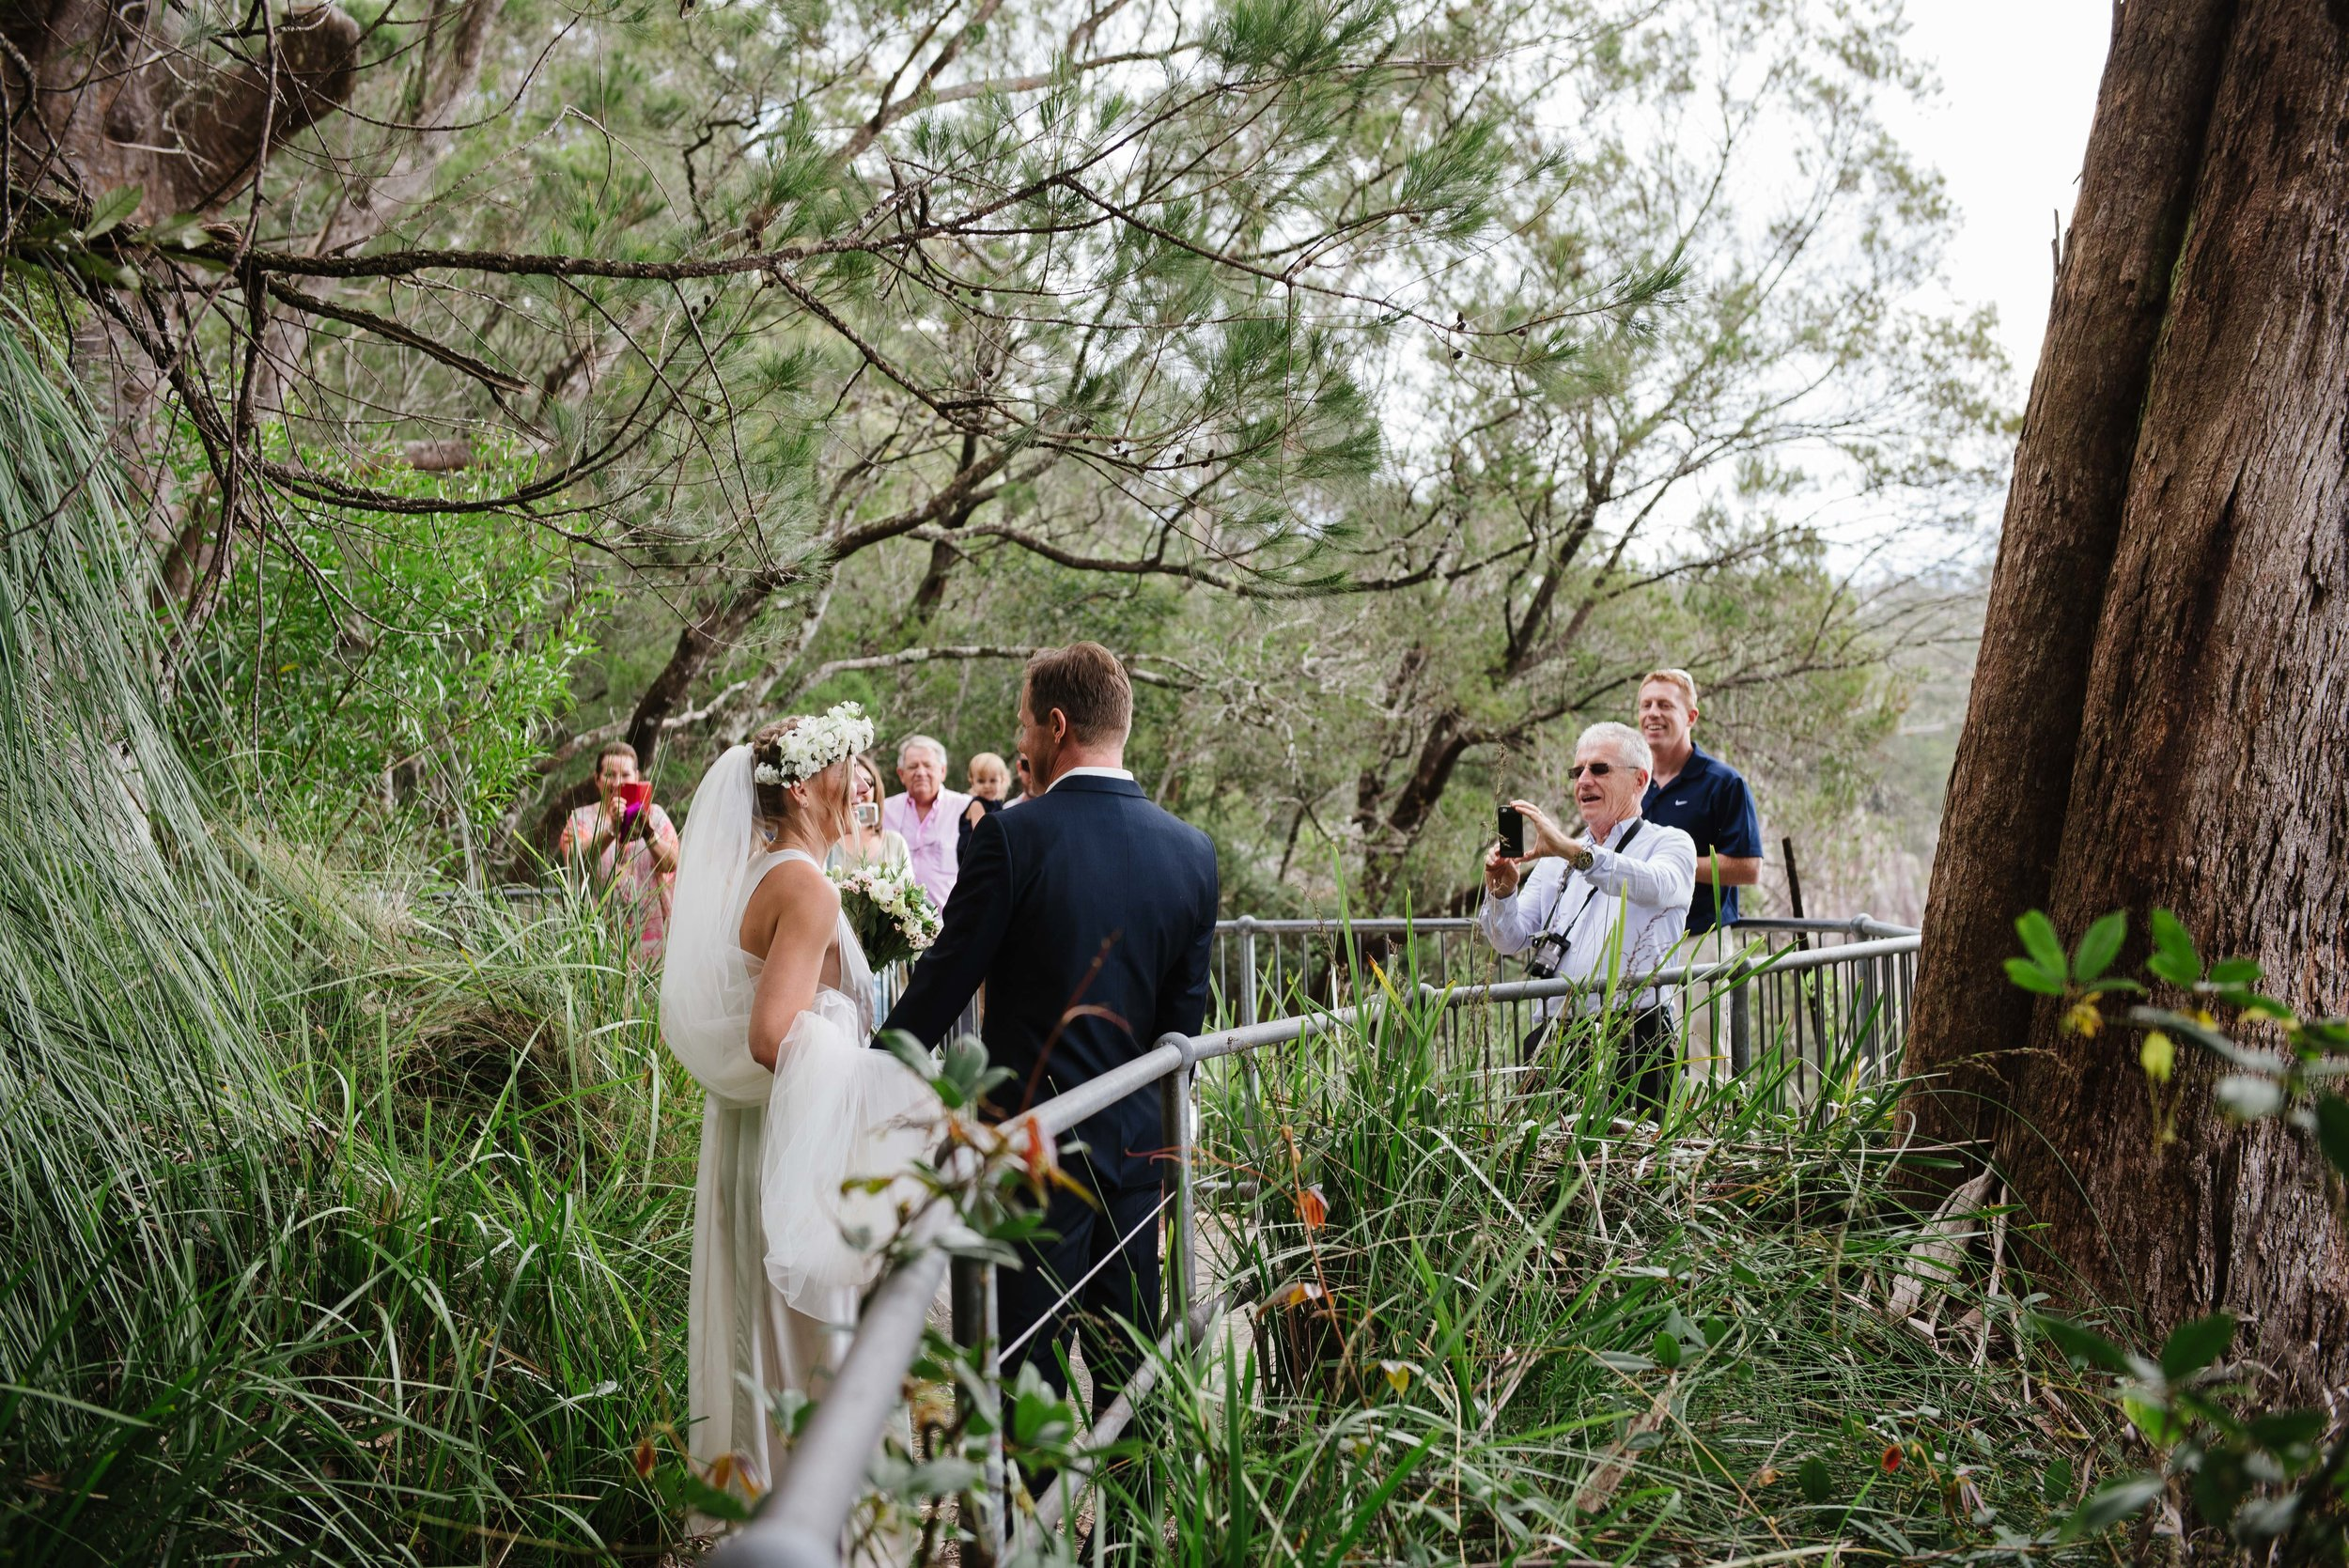 Carla and Luke- wedding photographer, byron bay wedding and family photographer, tweed heads wedding and family photography-217.jpg